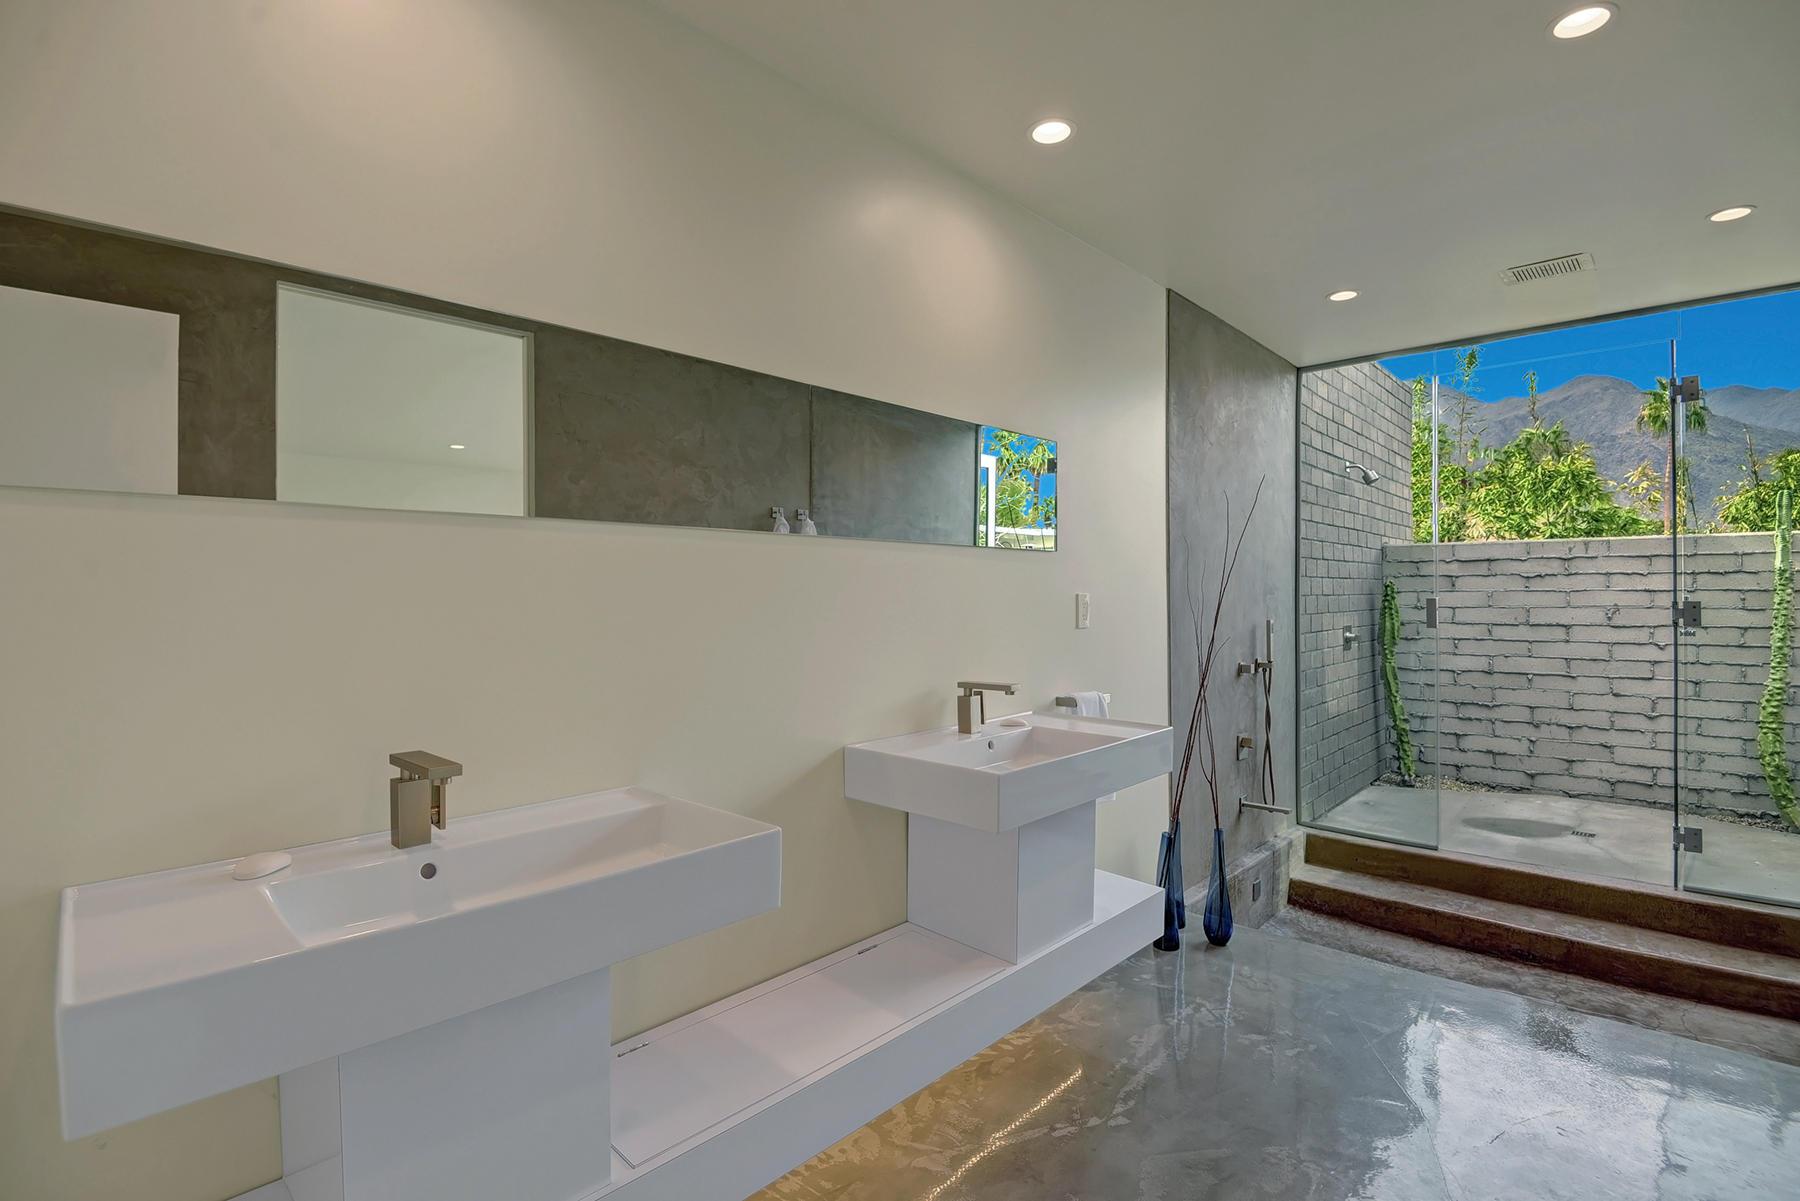 688 E Mel Avenue, Palm Springs, California 92262, 3 Bedrooms Bedrooms, ,3 BathroomsBathrooms,Residential,For Sale,688 E Mel Avenue,219037669